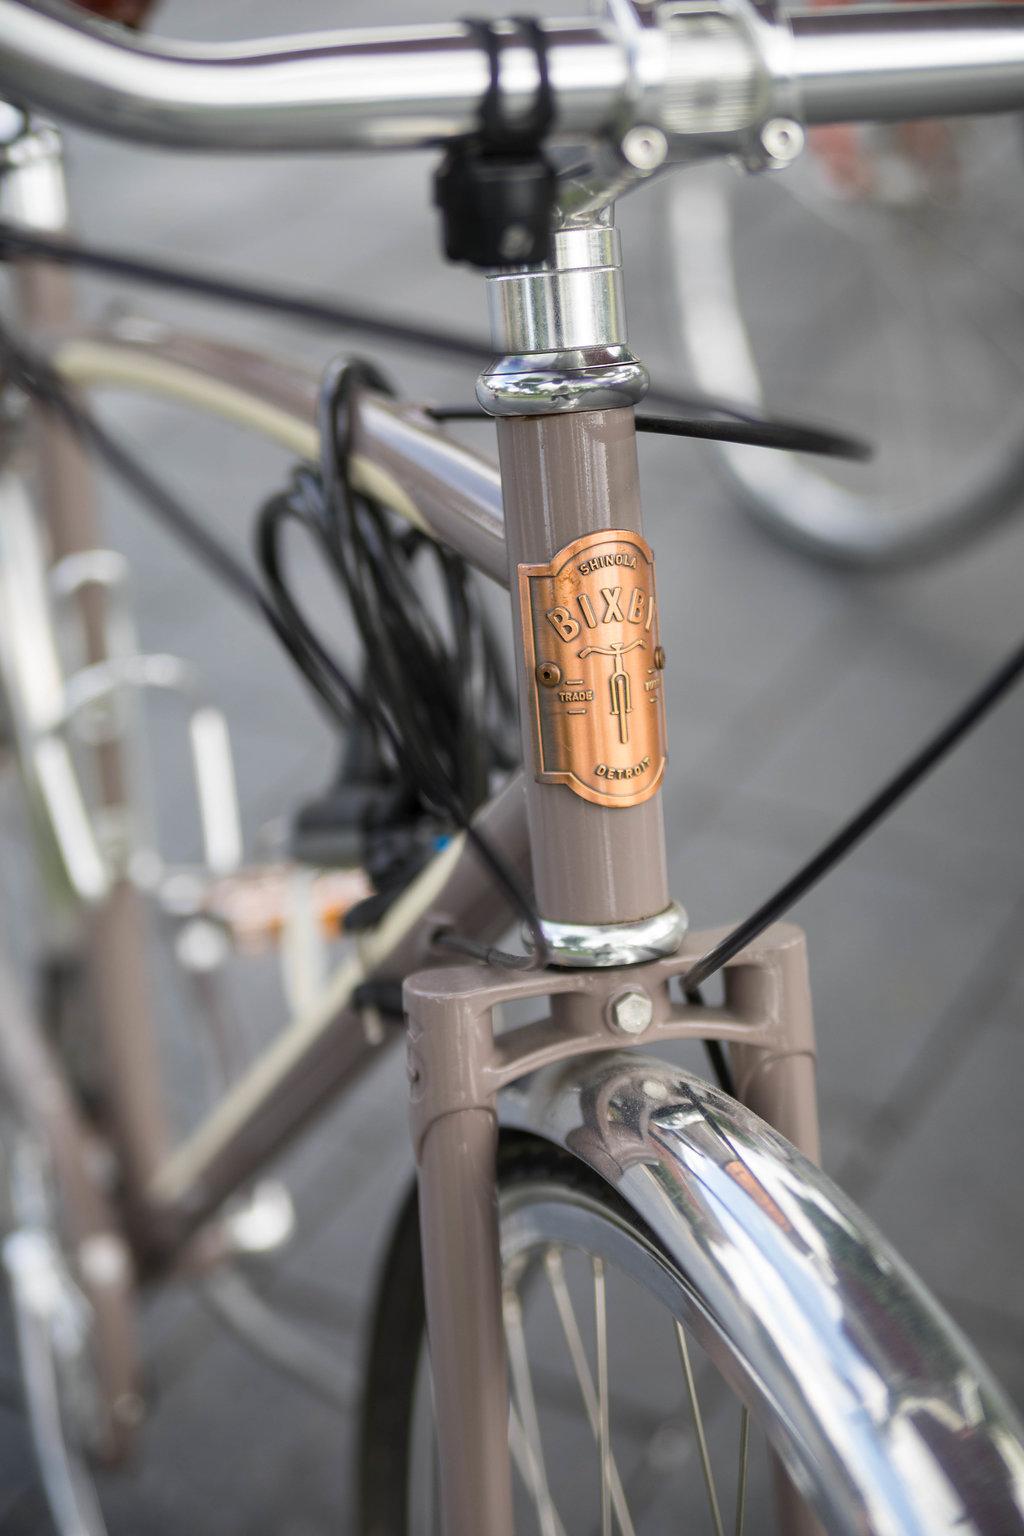 *Shinola Detroit Bixby Bike Ride at Townsend Hotel Birmingham Michigan